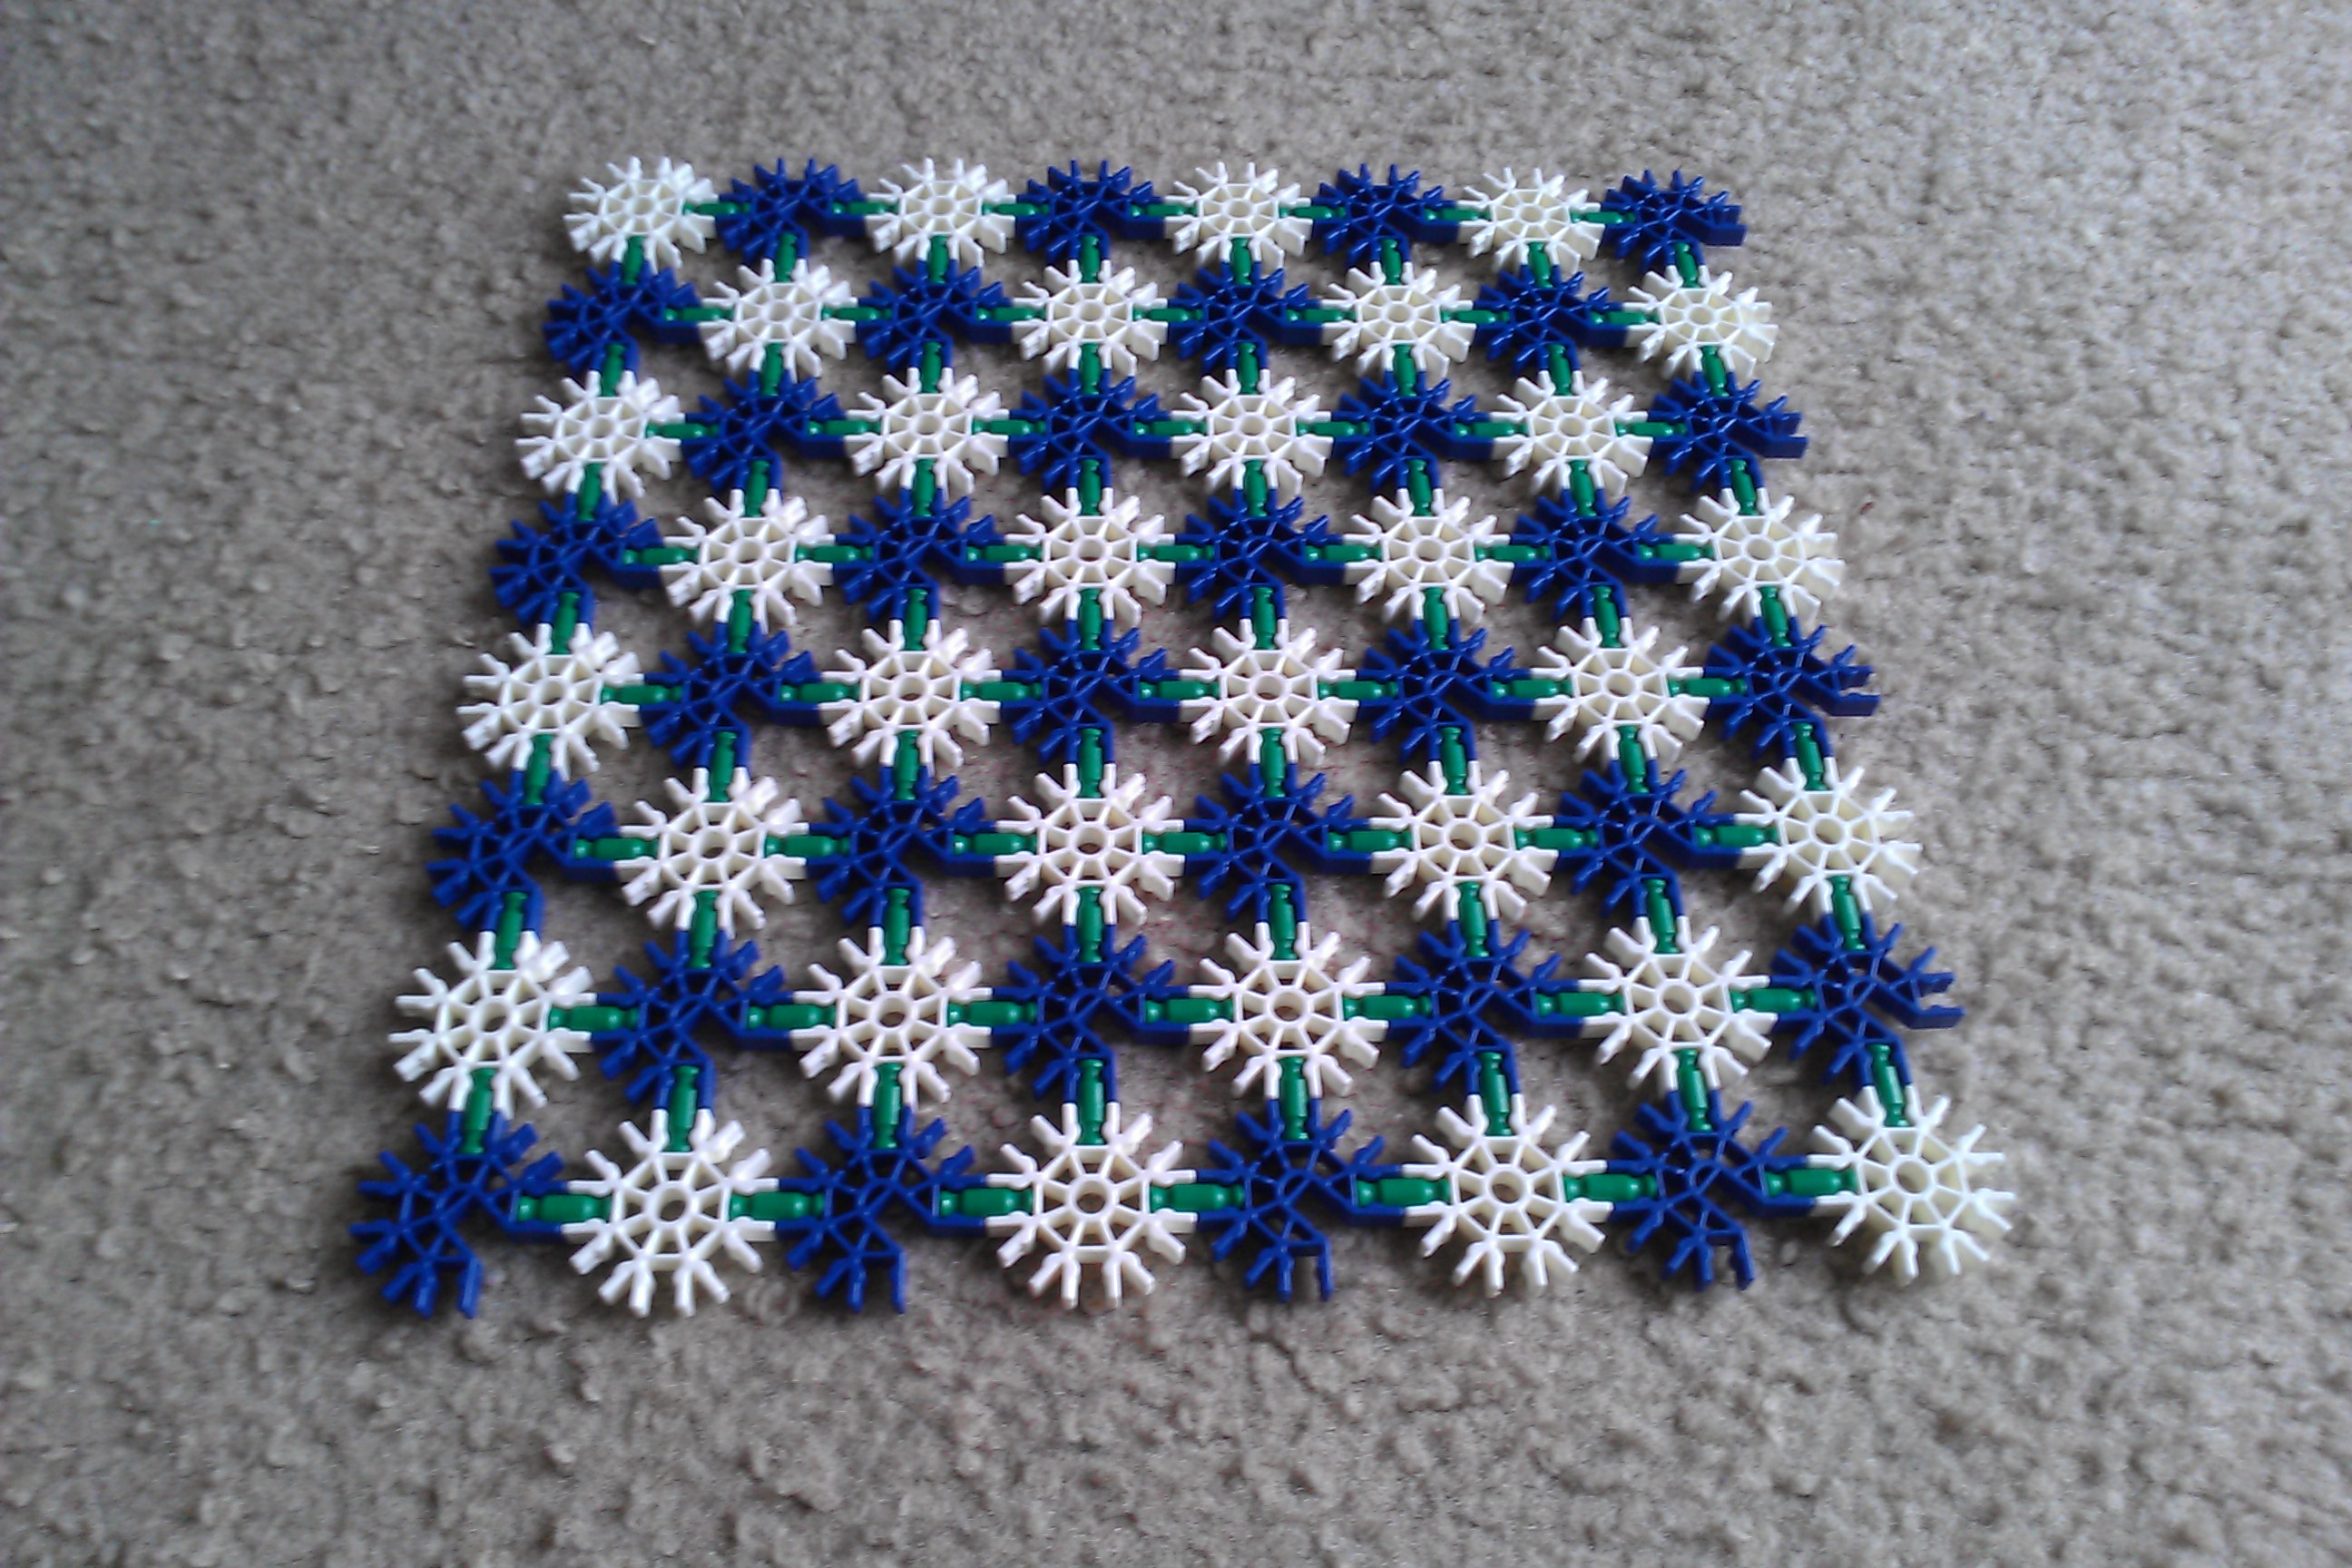 Picture of Checkerboard: Pieces; Arrange